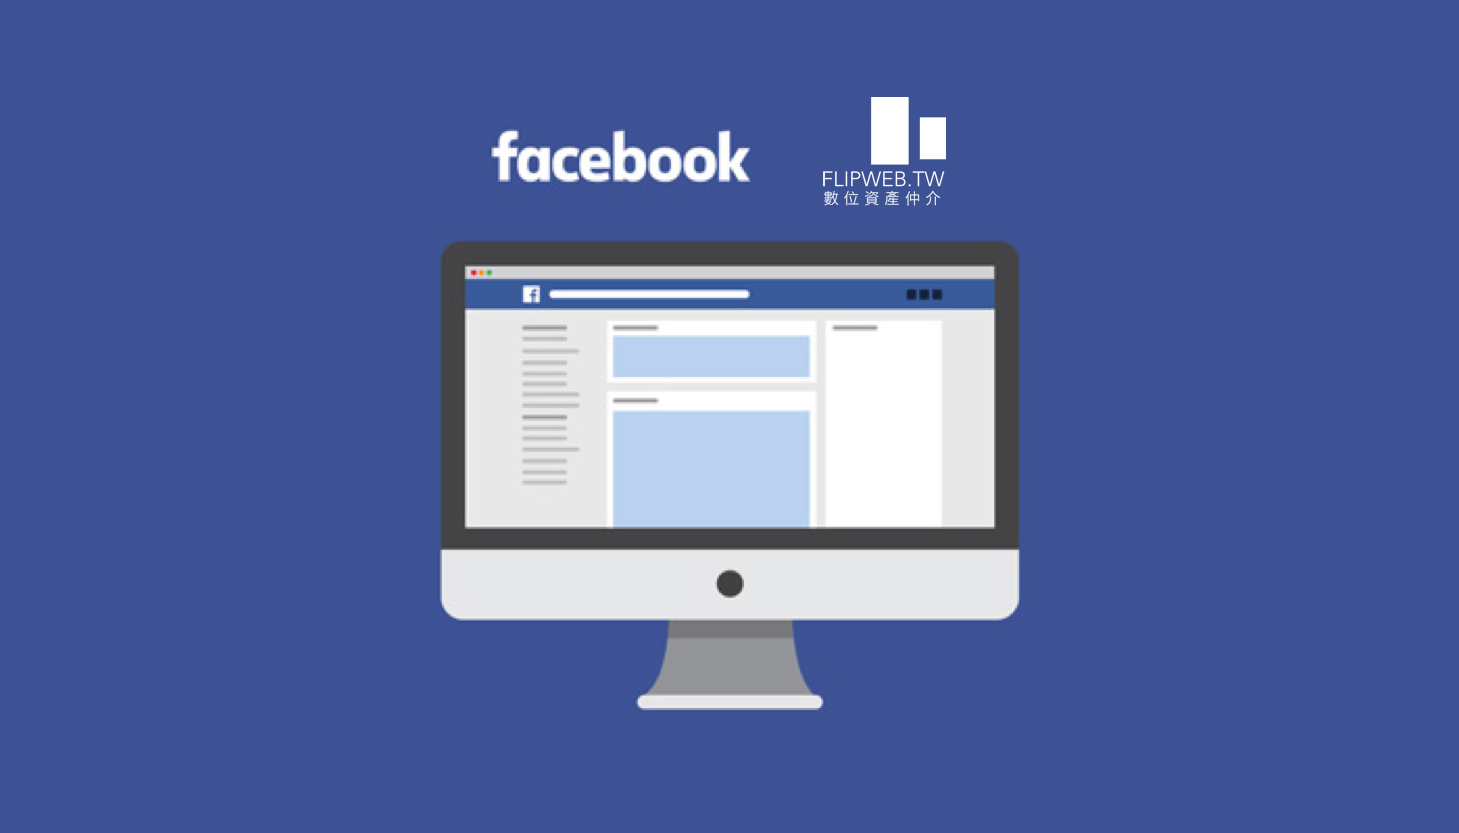 【FlipWeb數位資產顧問】賣Facebook粉絲專頁賺到第一桶金,談一談FB粉專的買賣